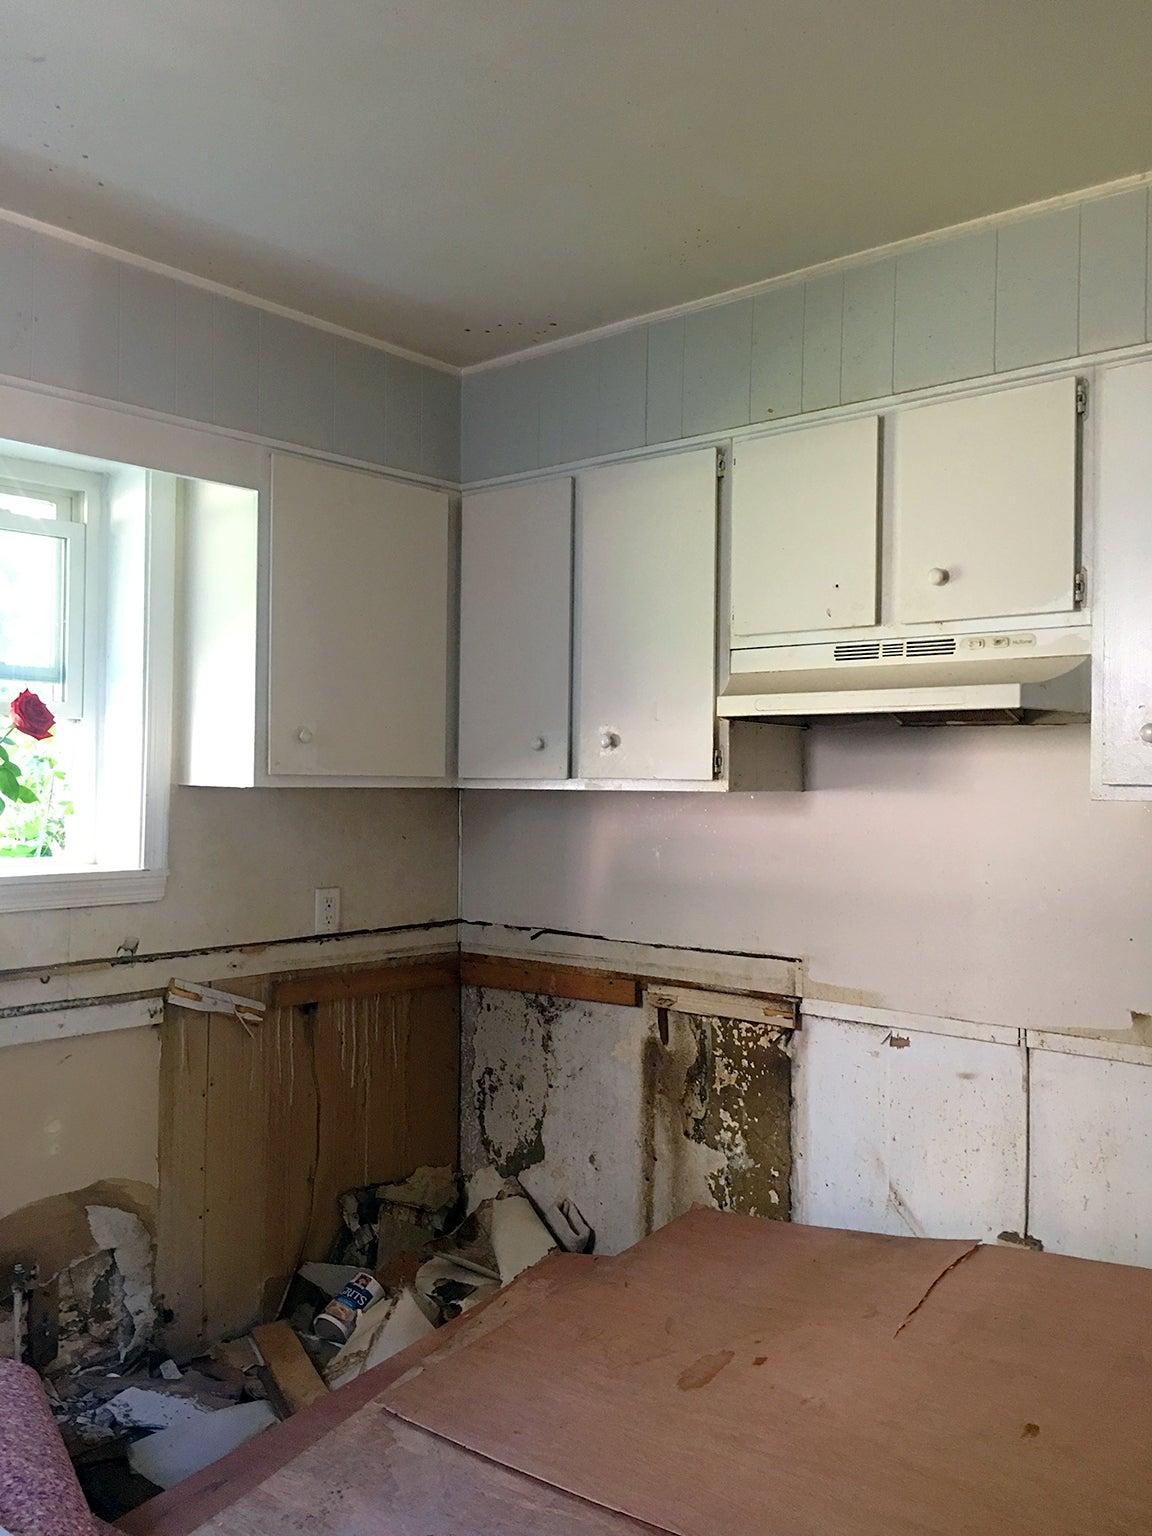 before image of half demolished kitchen